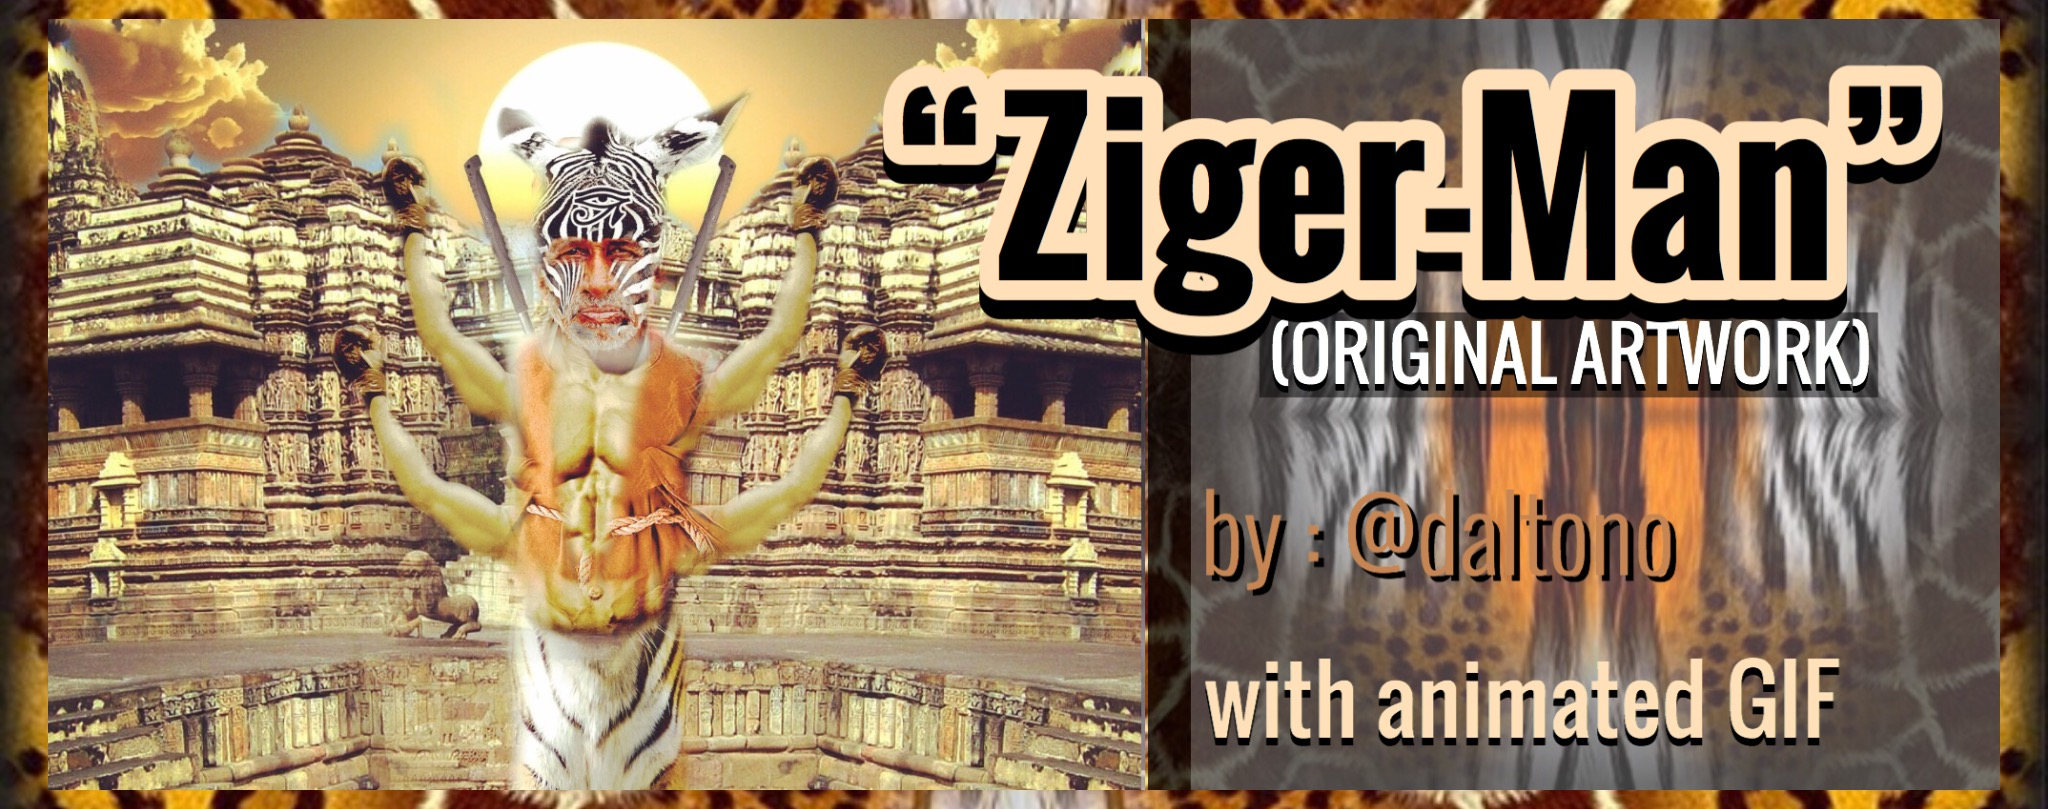 ziger-man-thumbnail.JPG